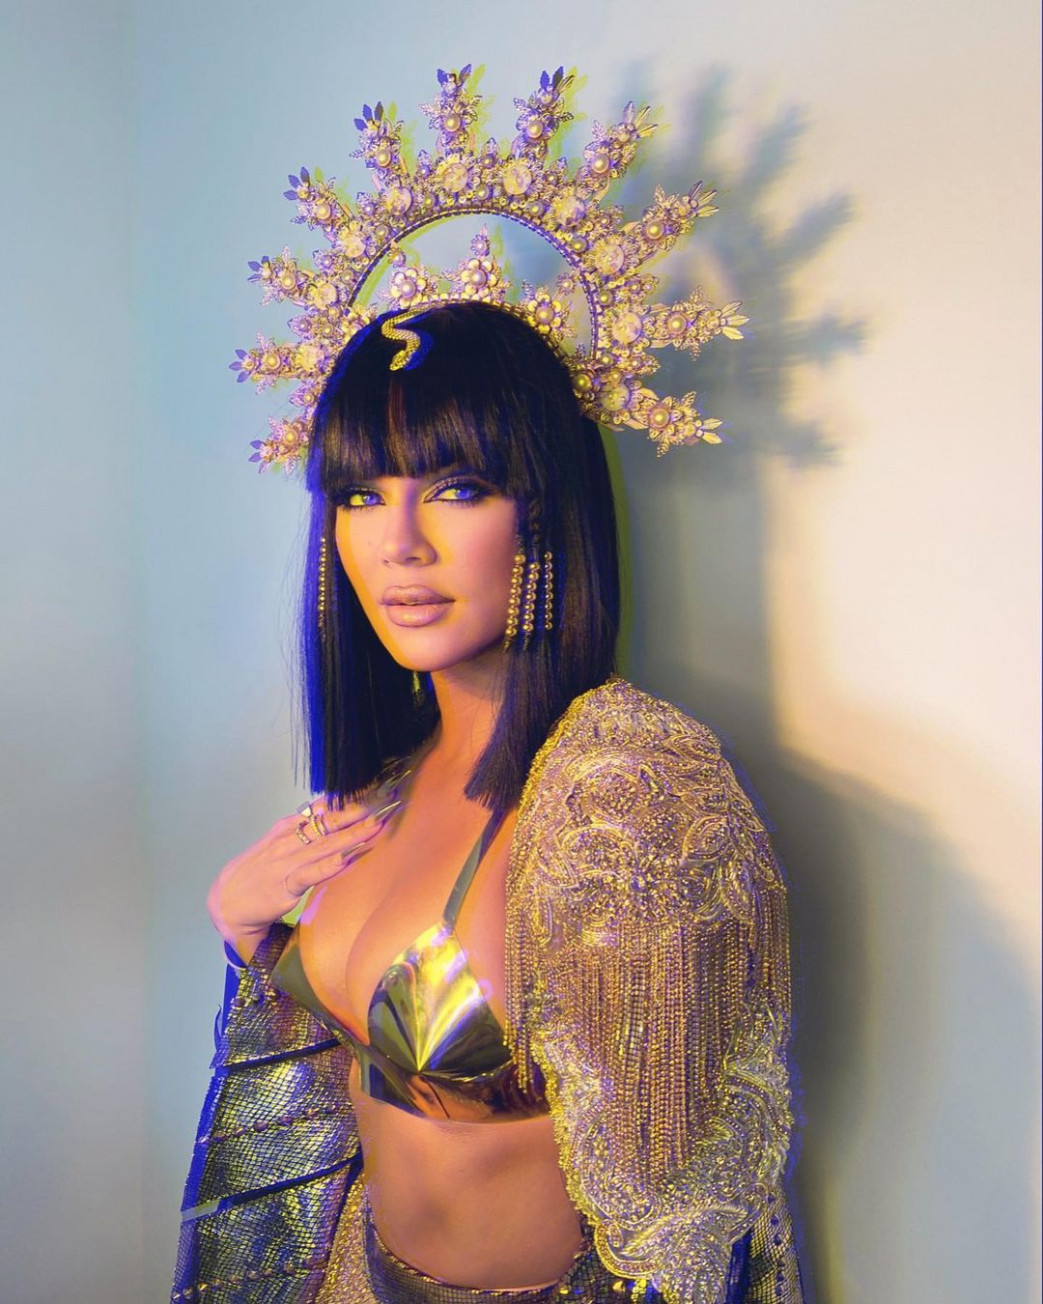 Khloe-Kardashian-Hot-In-Cleopatra-Halloween-Costume-2.jpg